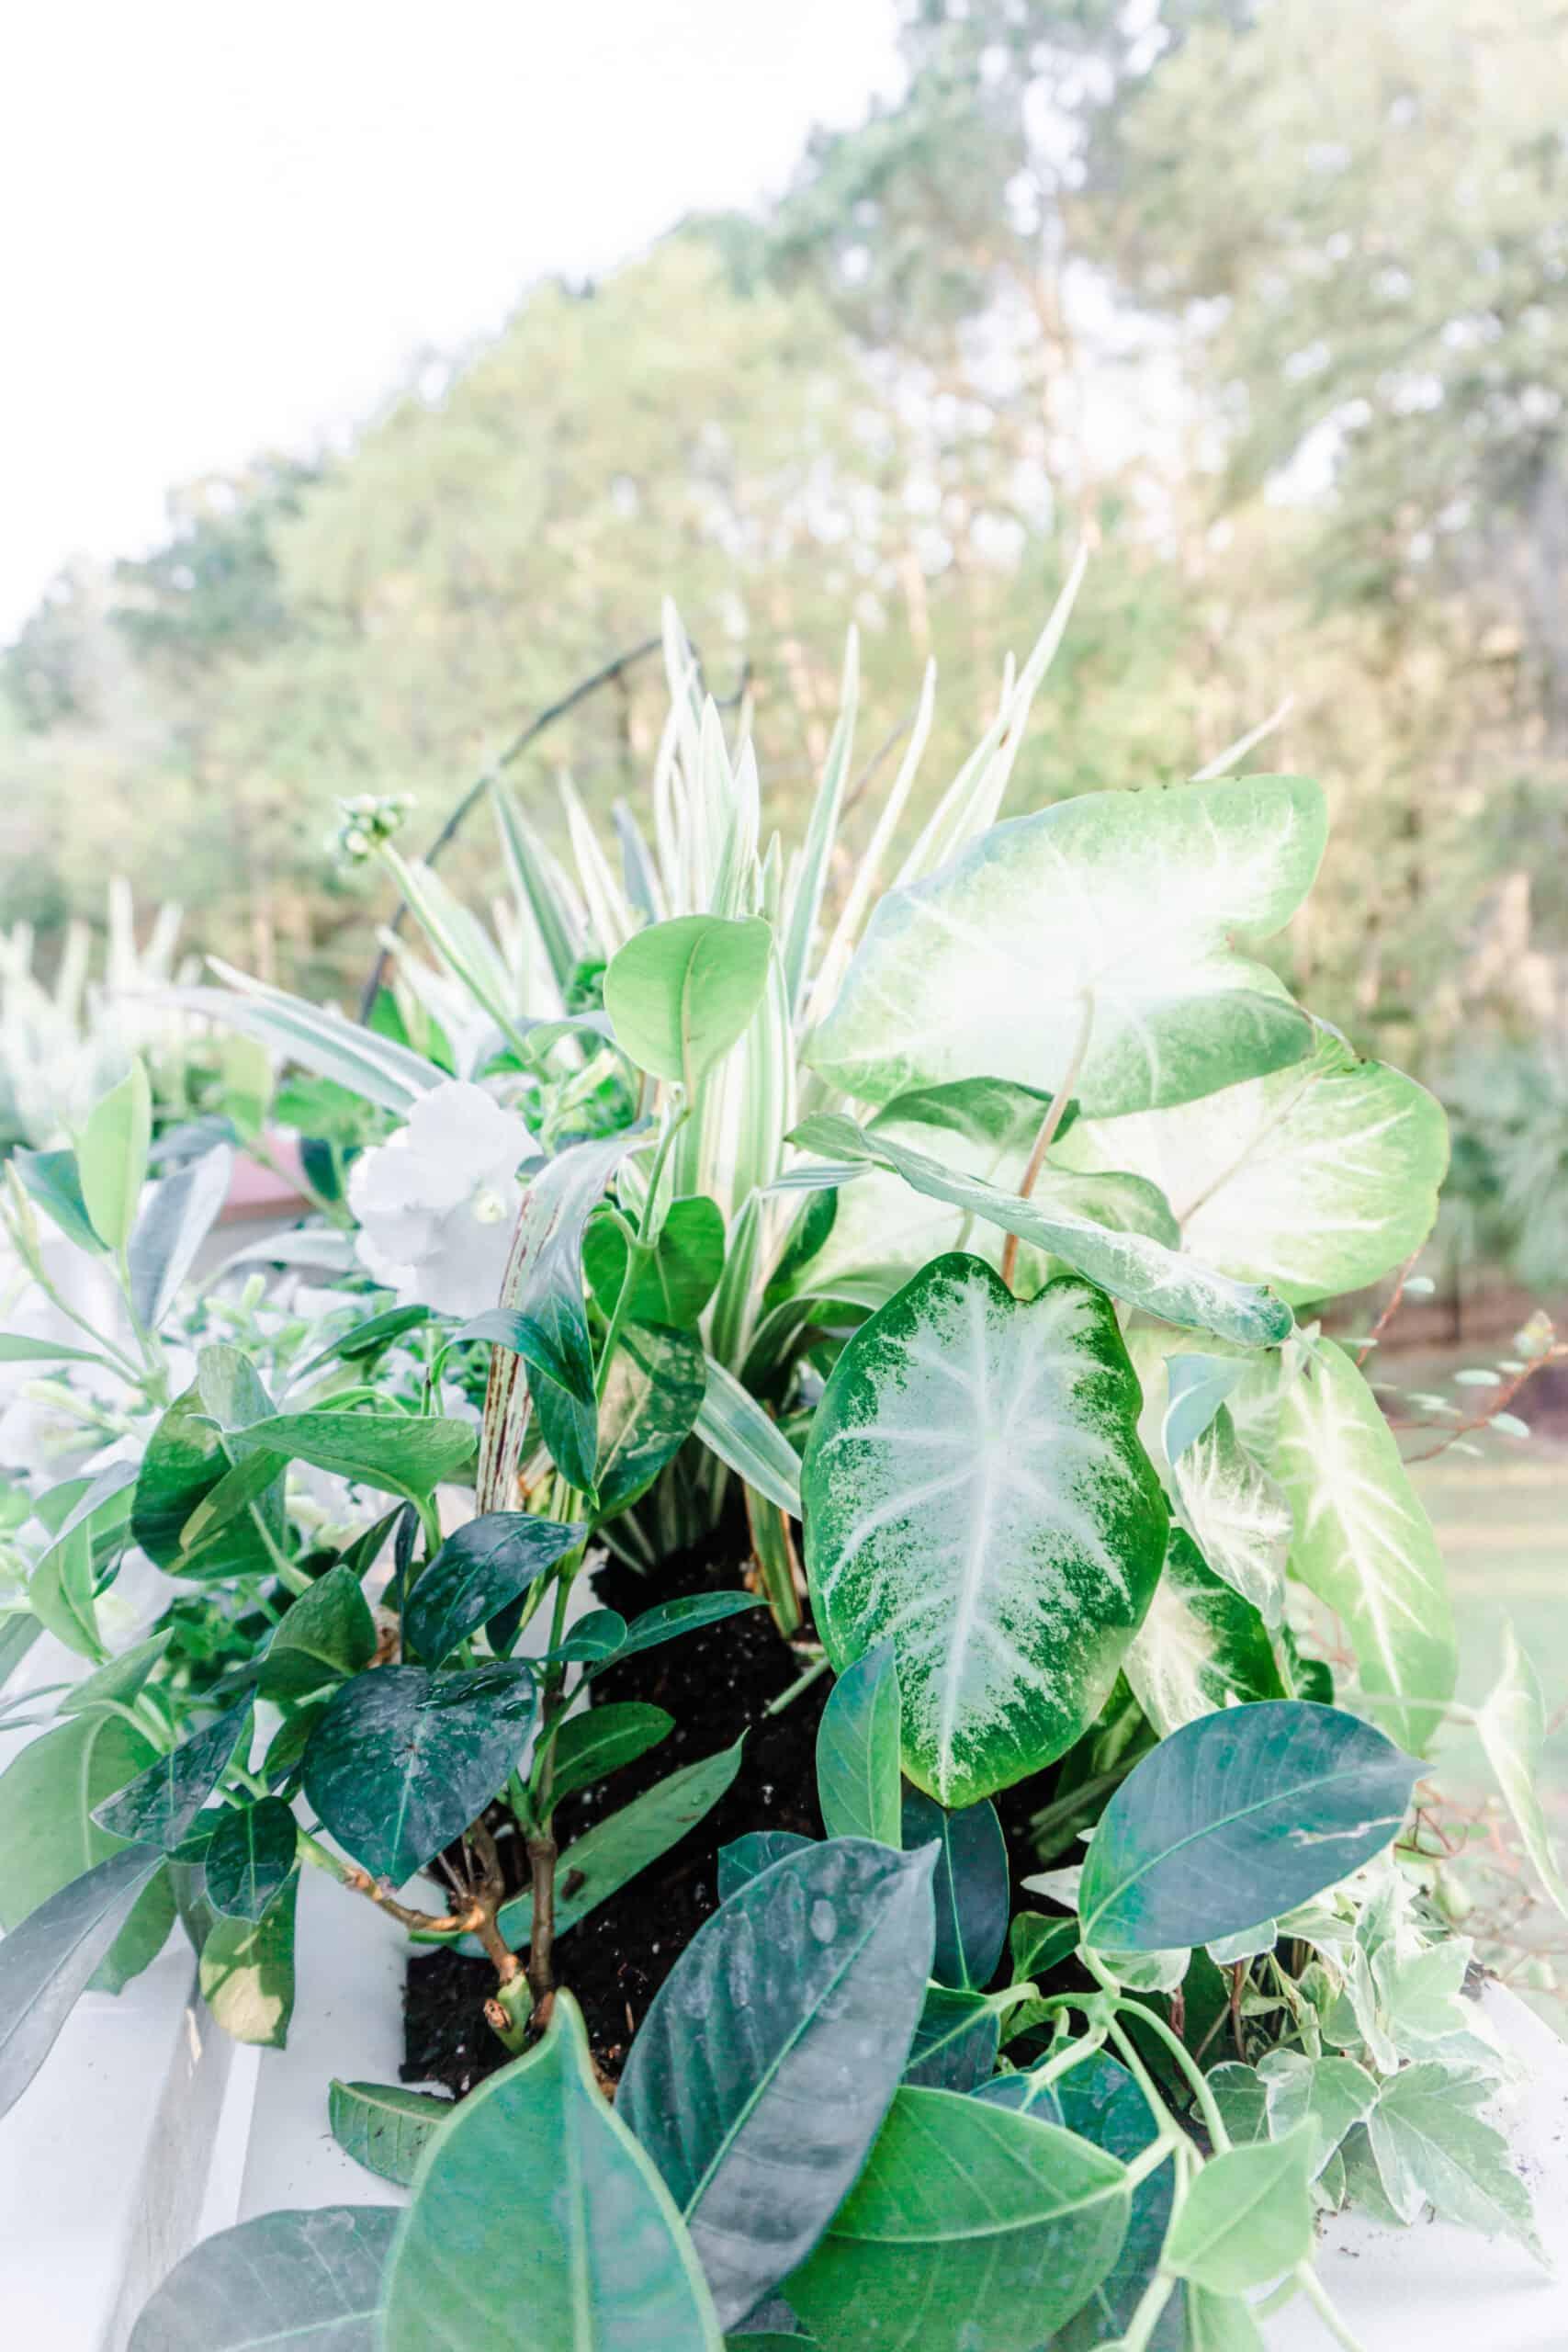 Window box with shade plants.